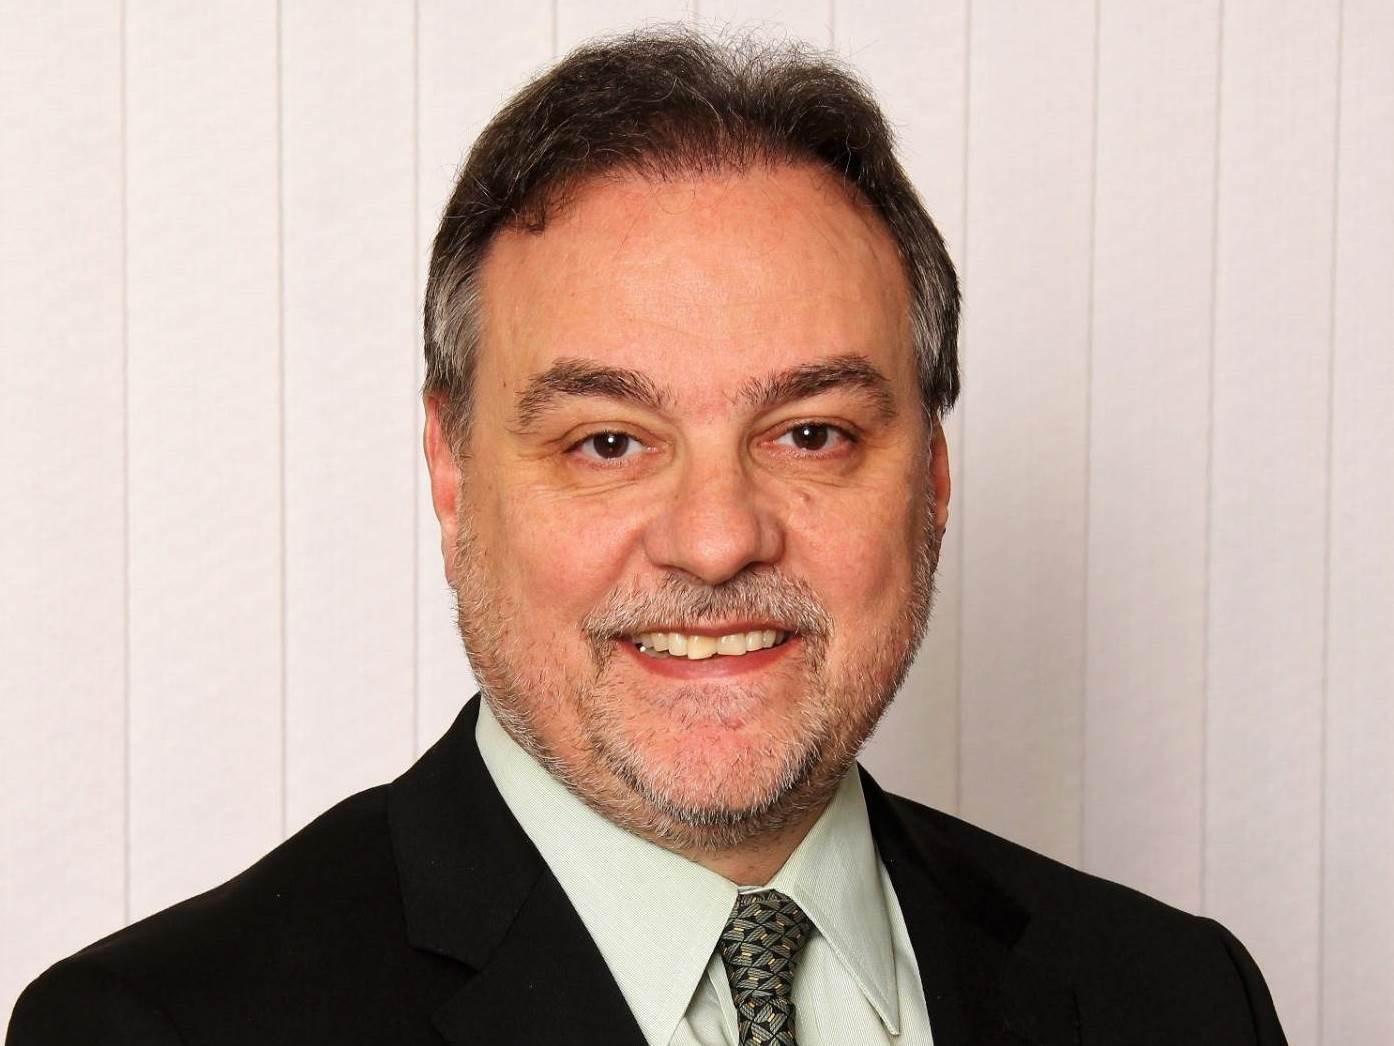 Dr Genco